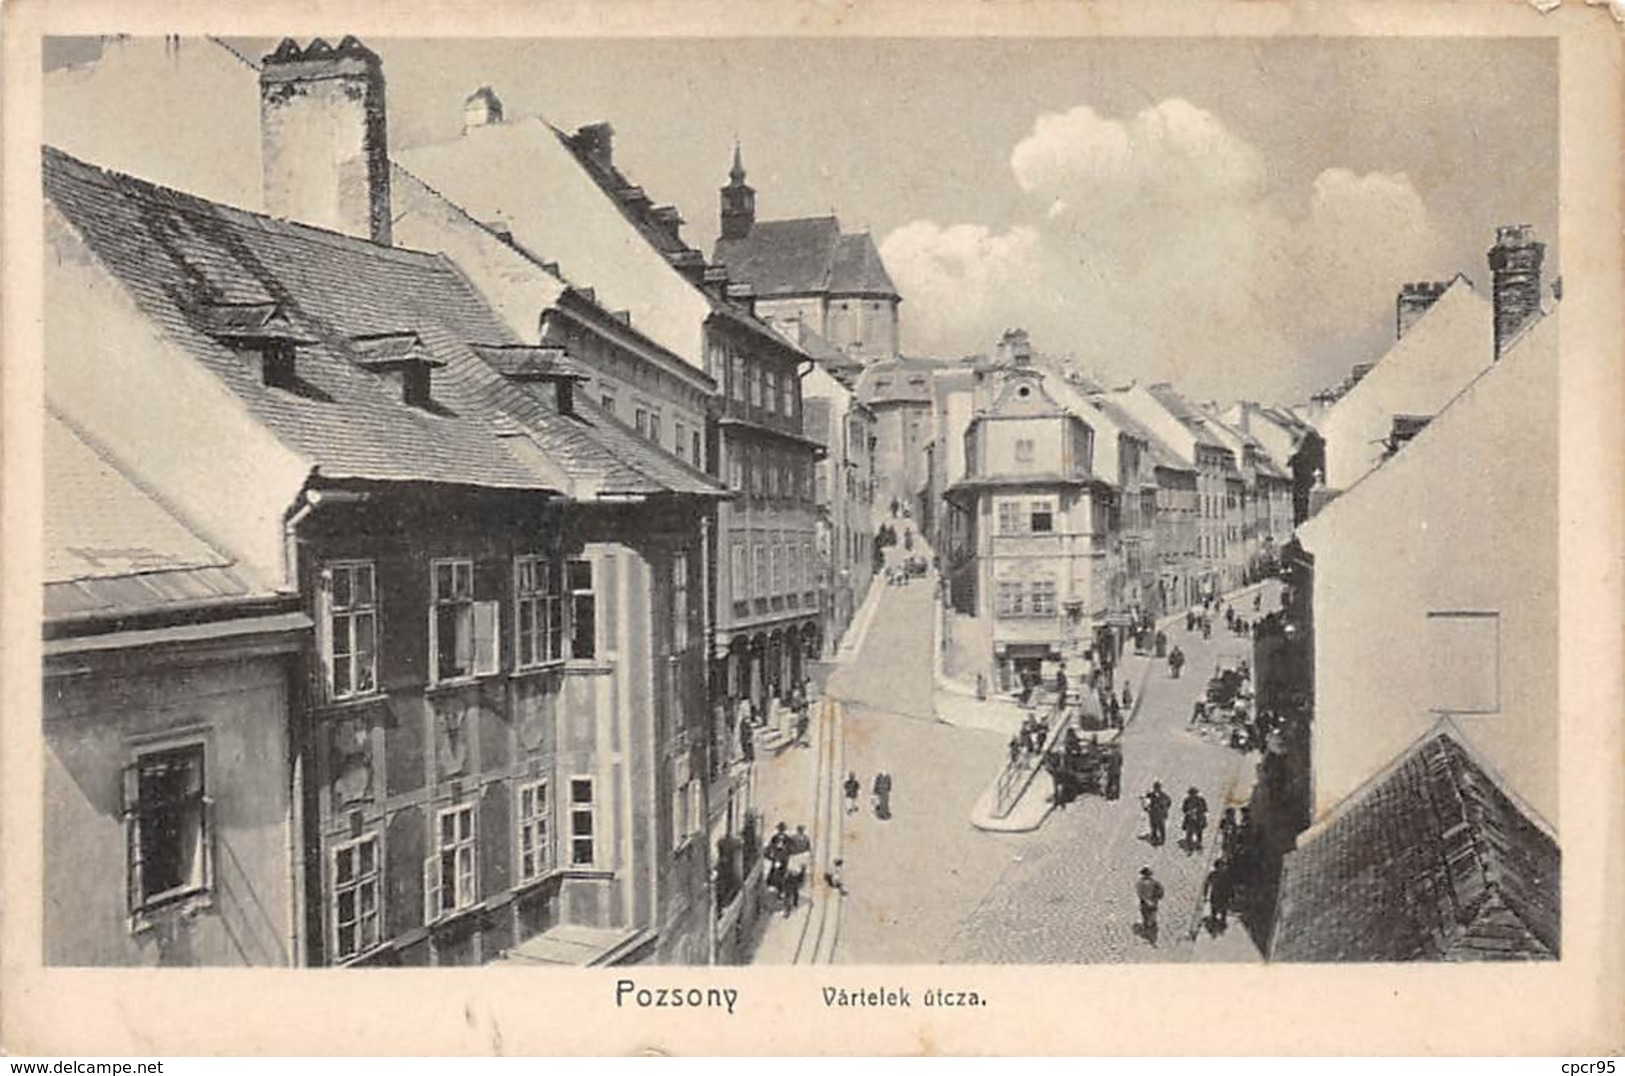 Slovaquie - N°61334 - POZZONY - Vartelek Utcza - Slovacchia